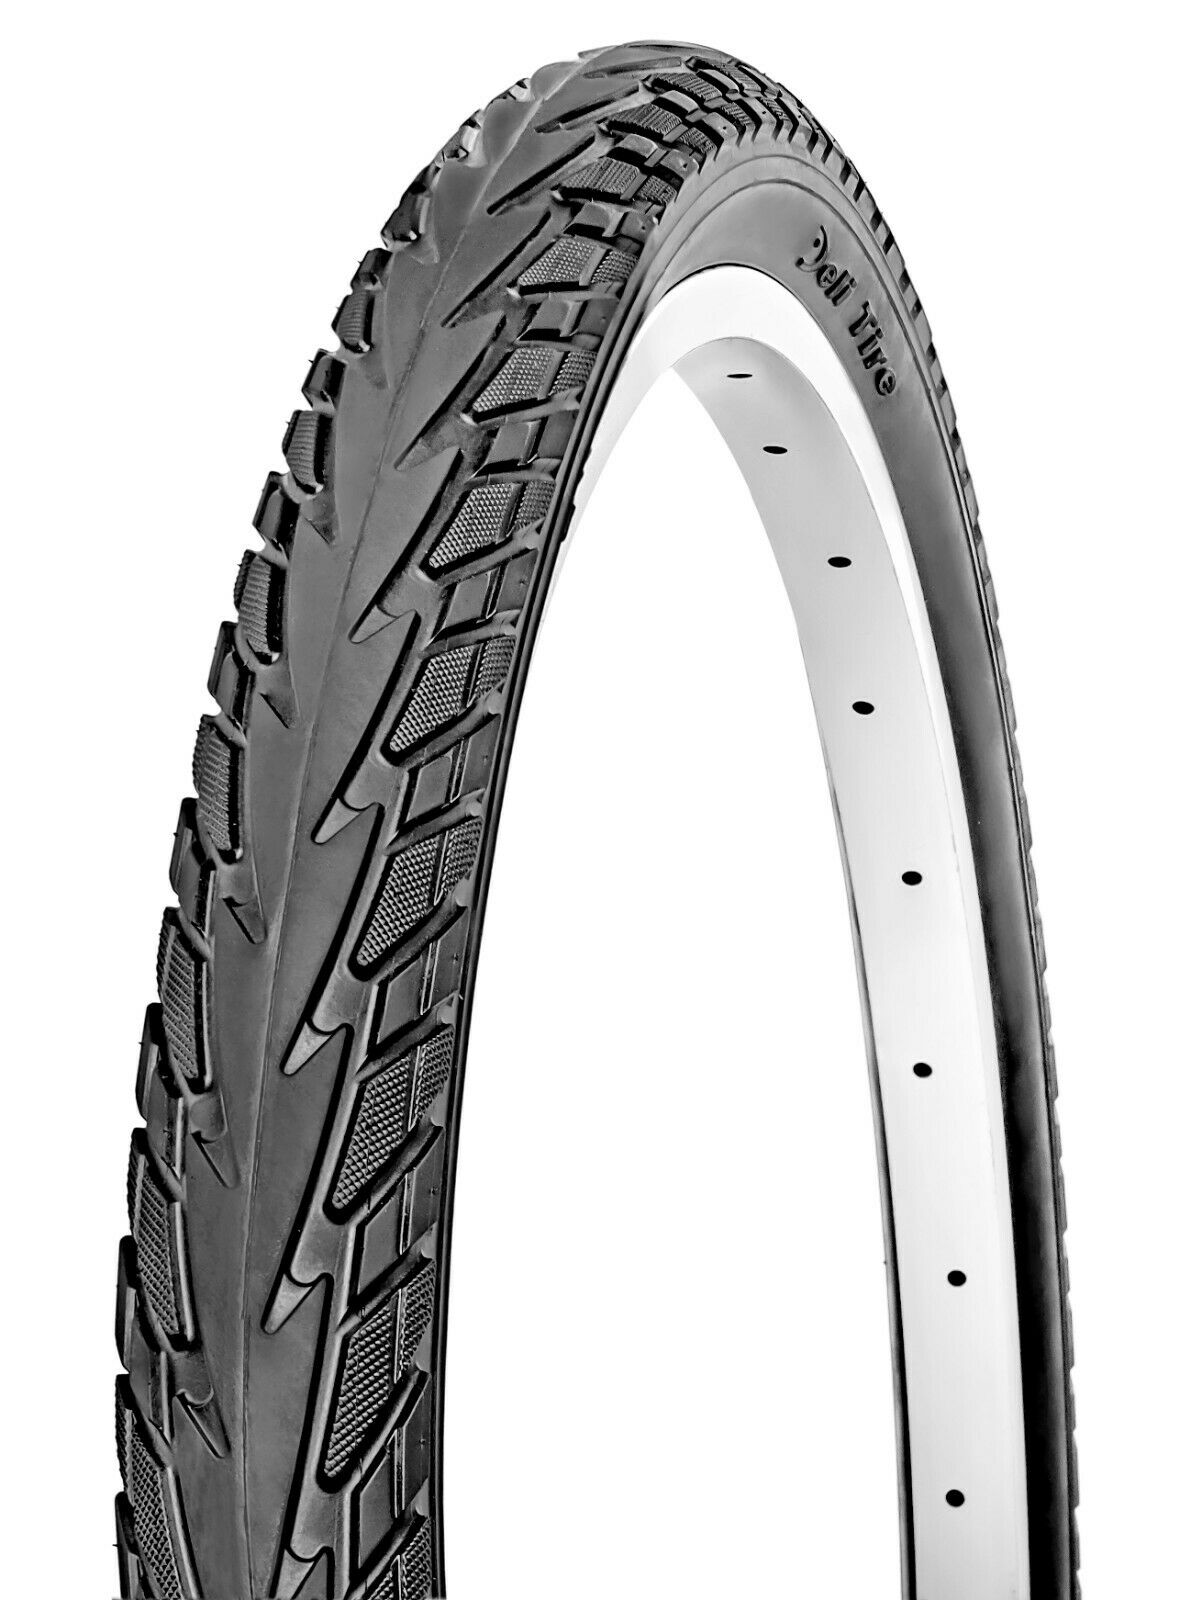 Schwalb Impac Crosspac 700c x 38 cBicycle Hybrid Tyres Bike Cycle MTB Road .